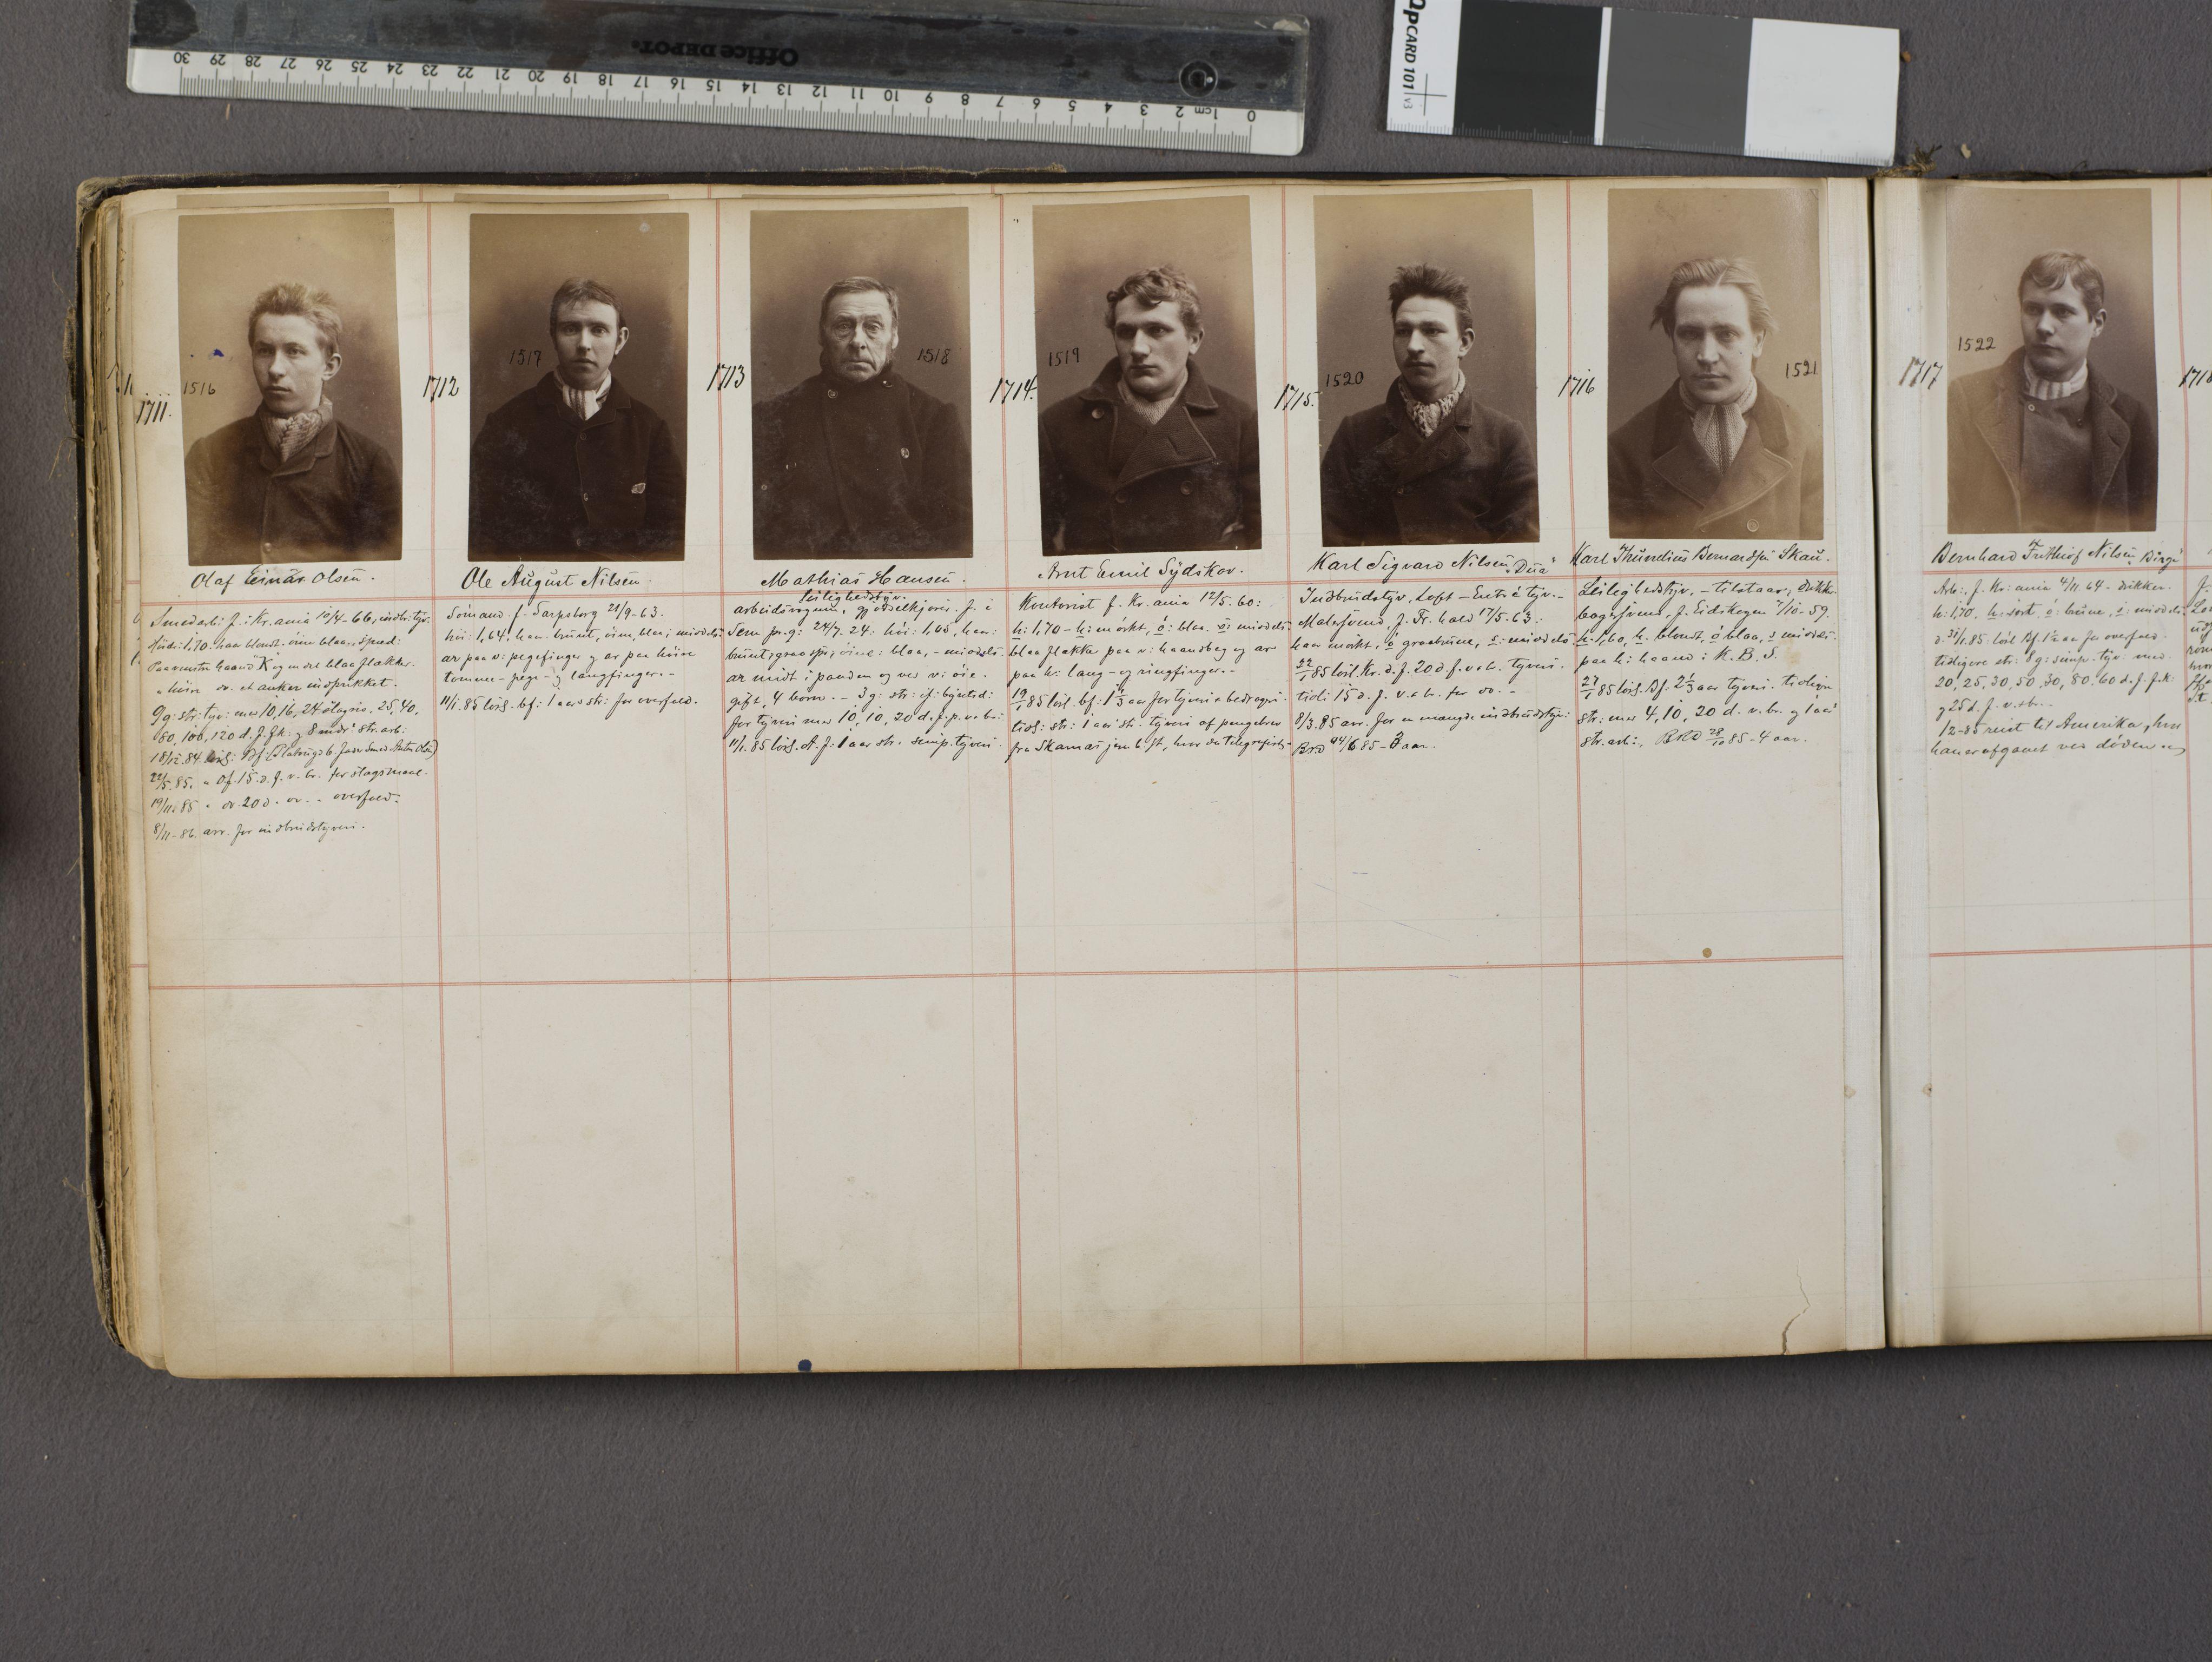 SAO, Oslo politikammer, Kriminalavdelingen, U/Ua/L0001: Forbryteralbum, 1880-1887, s. 31